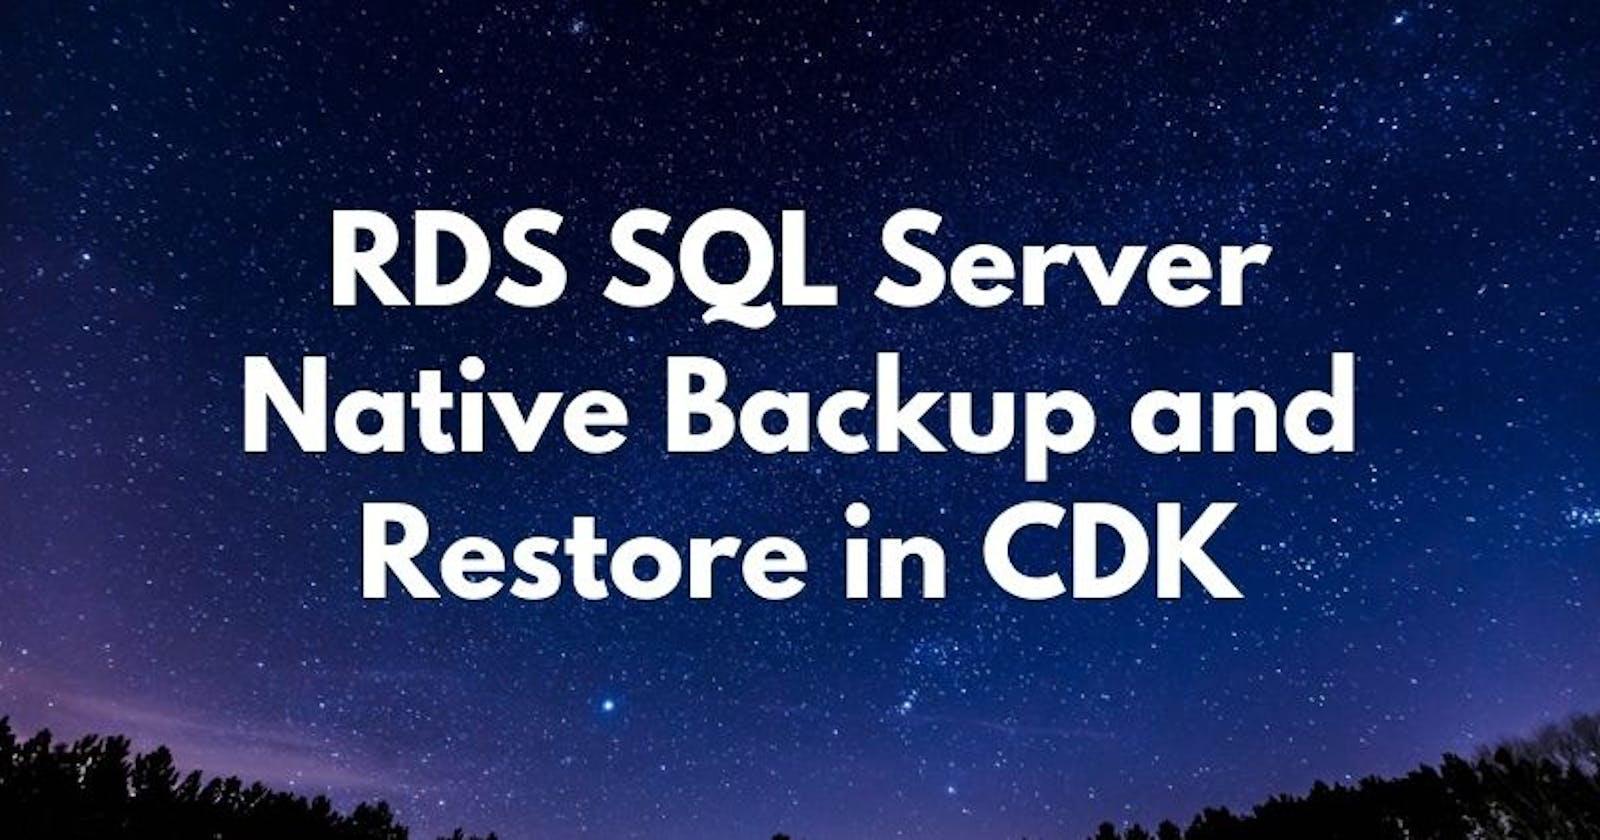 RDS SQL Server - Native Backup and Restore in CDK